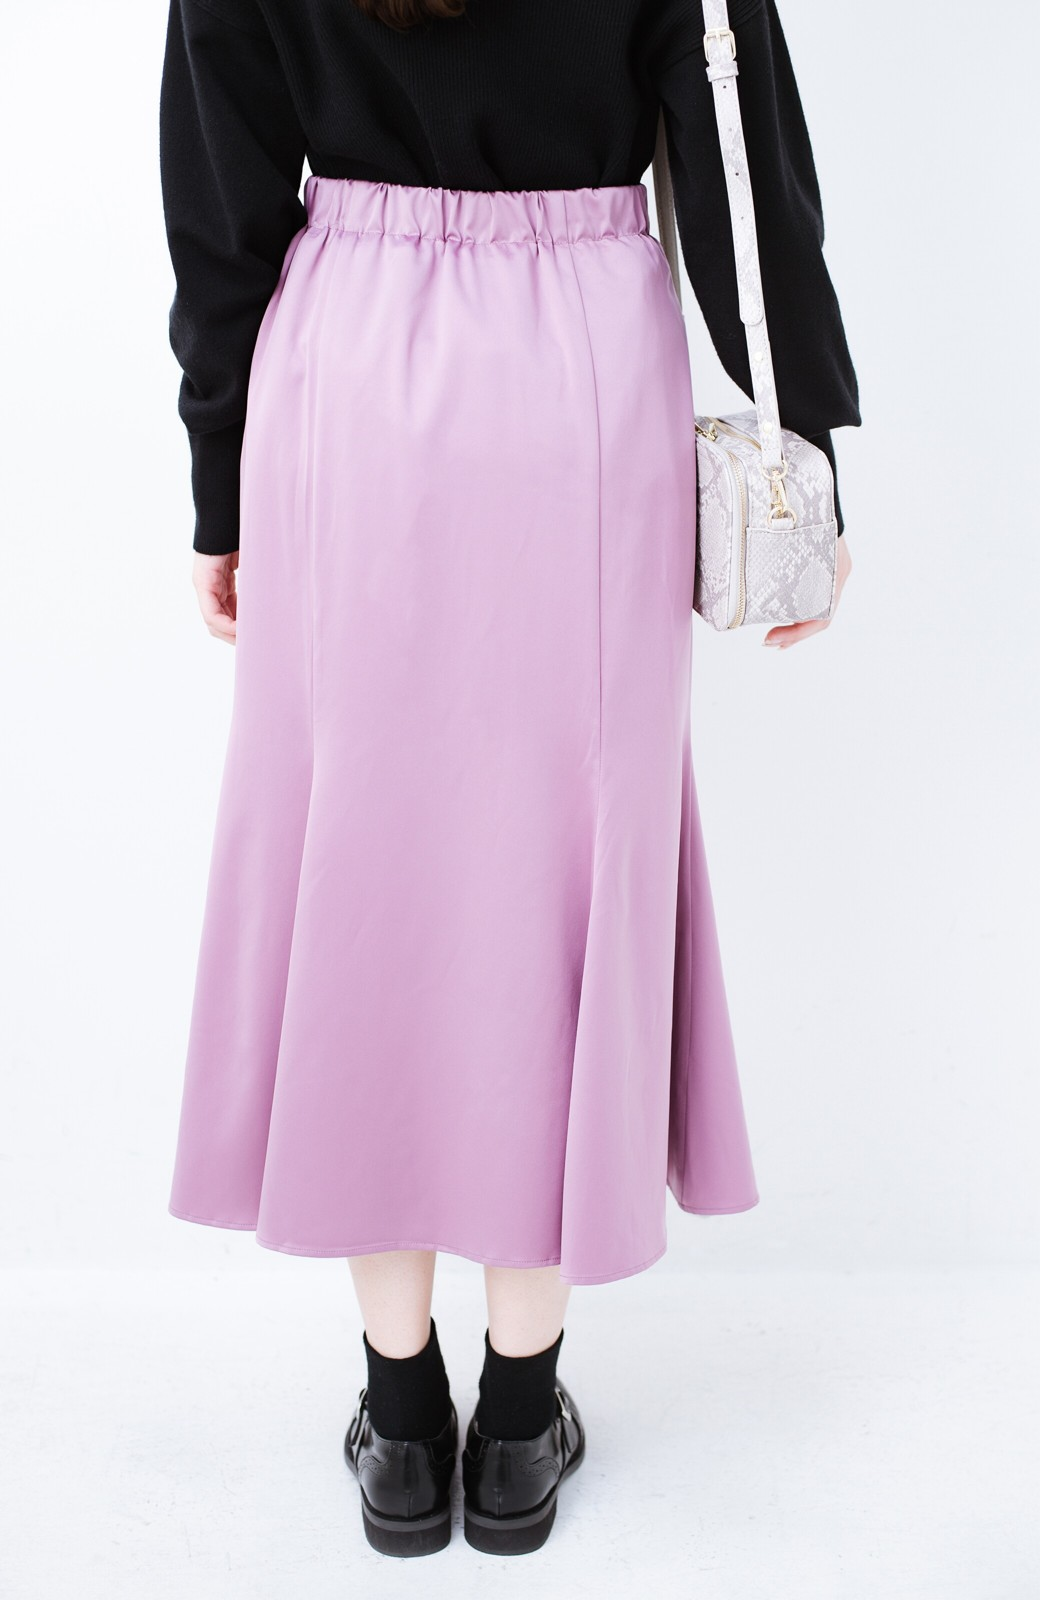 haco! スウェットやスニーカーを合わせても女っぽくいられるサテンマーメイドスカート by que made me <ピンク>の商品写真7